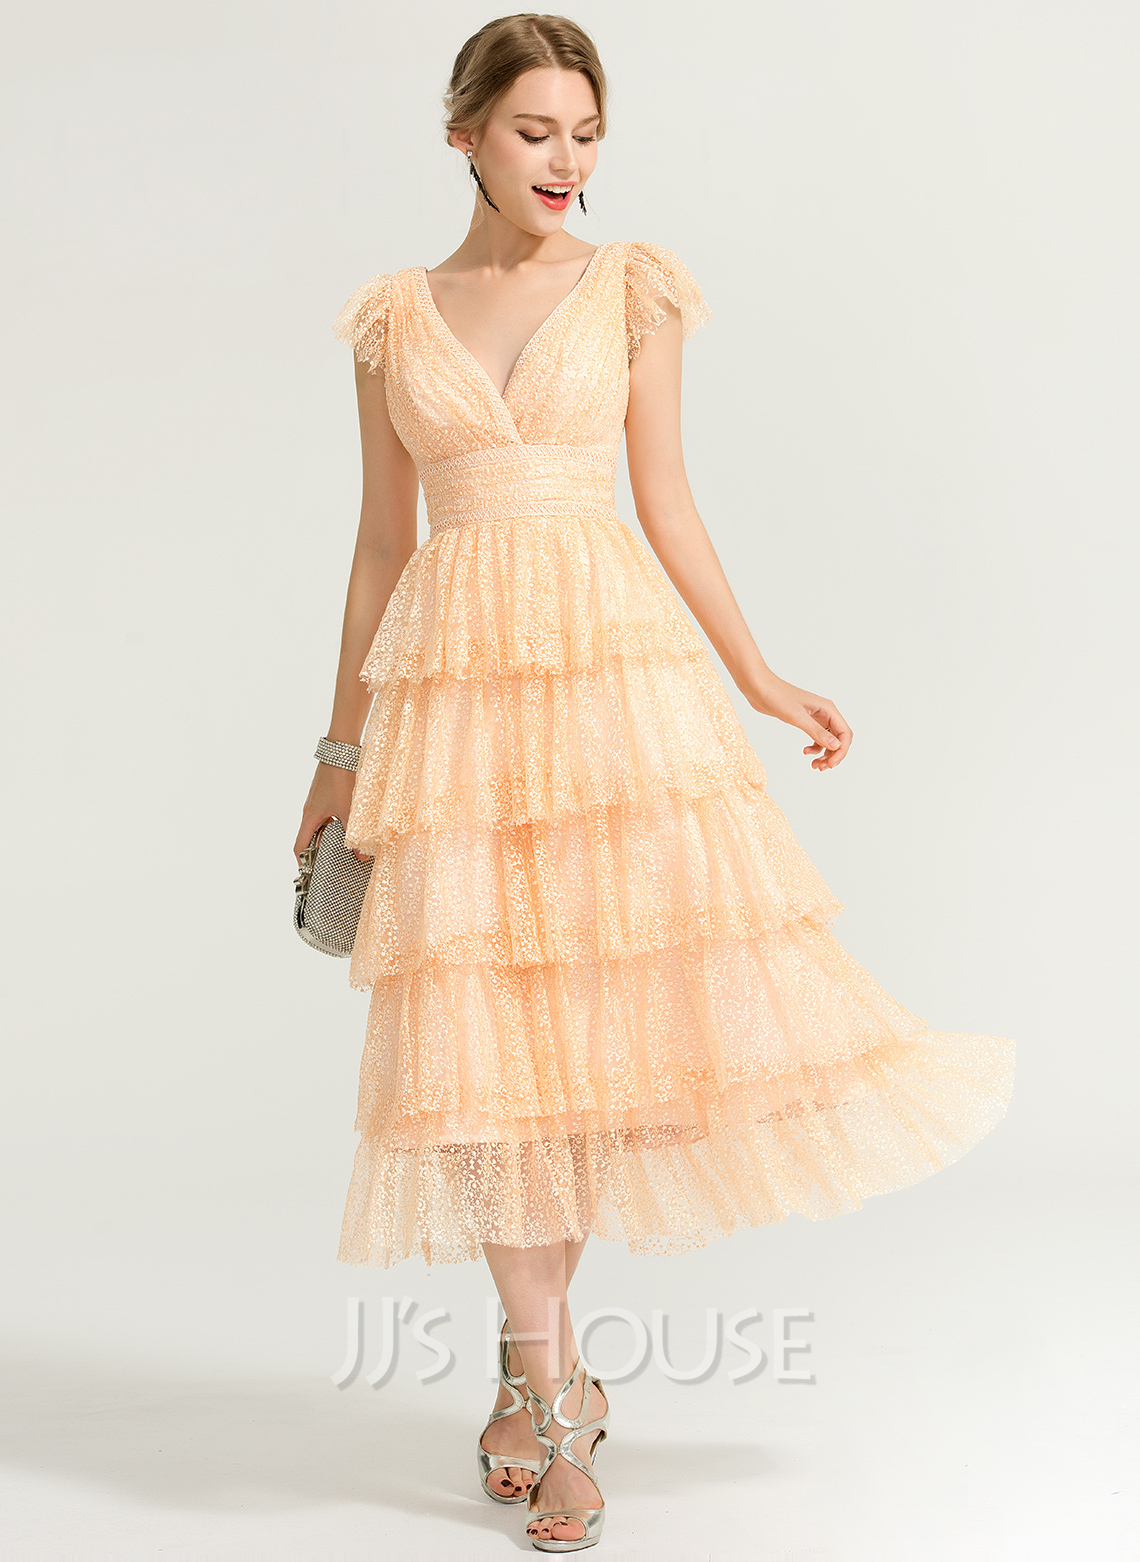 A-Line V-neck Tea-Length Lace Cocktail Dress